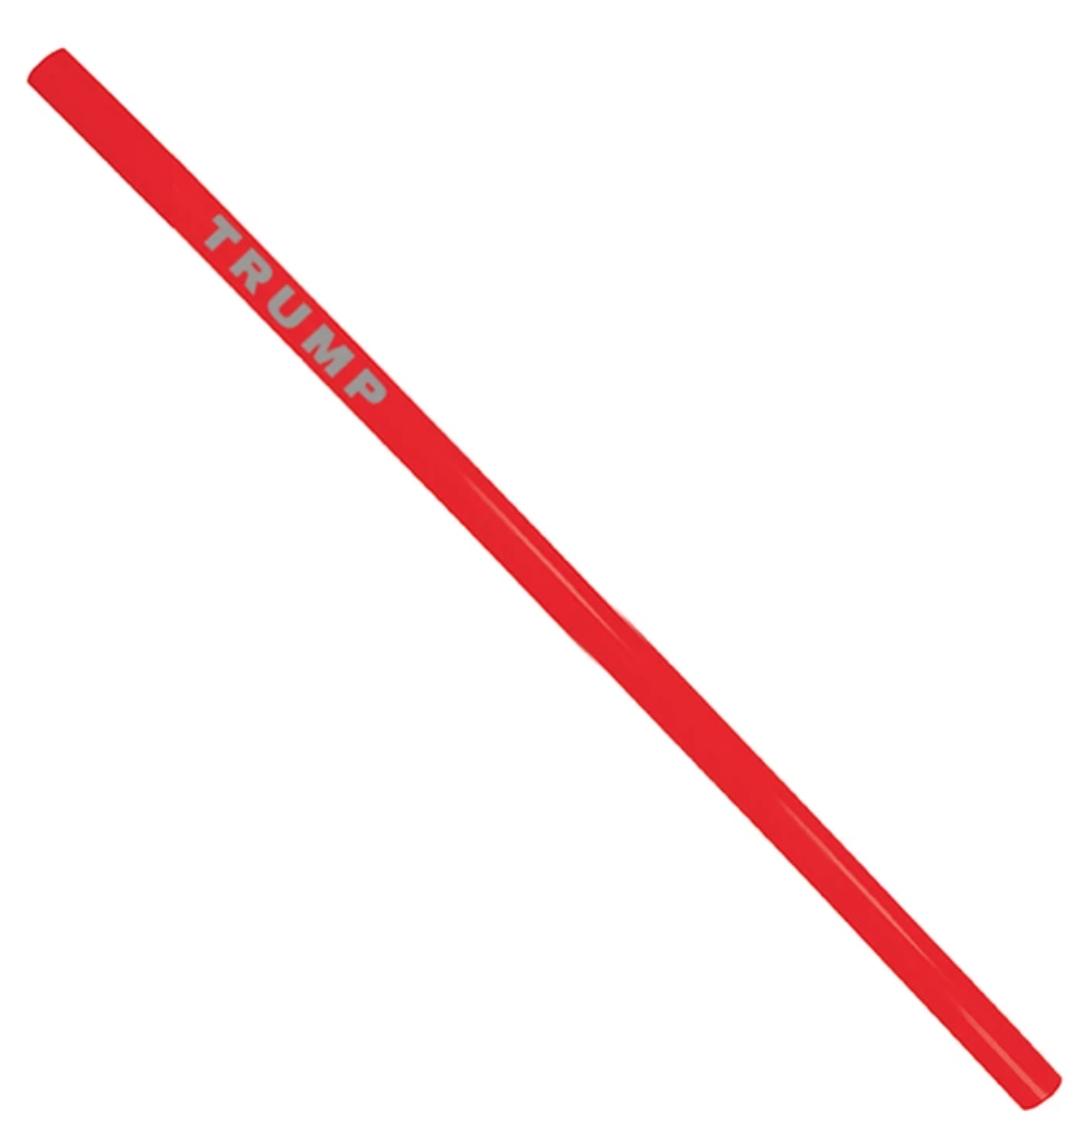 Trump-branded straws